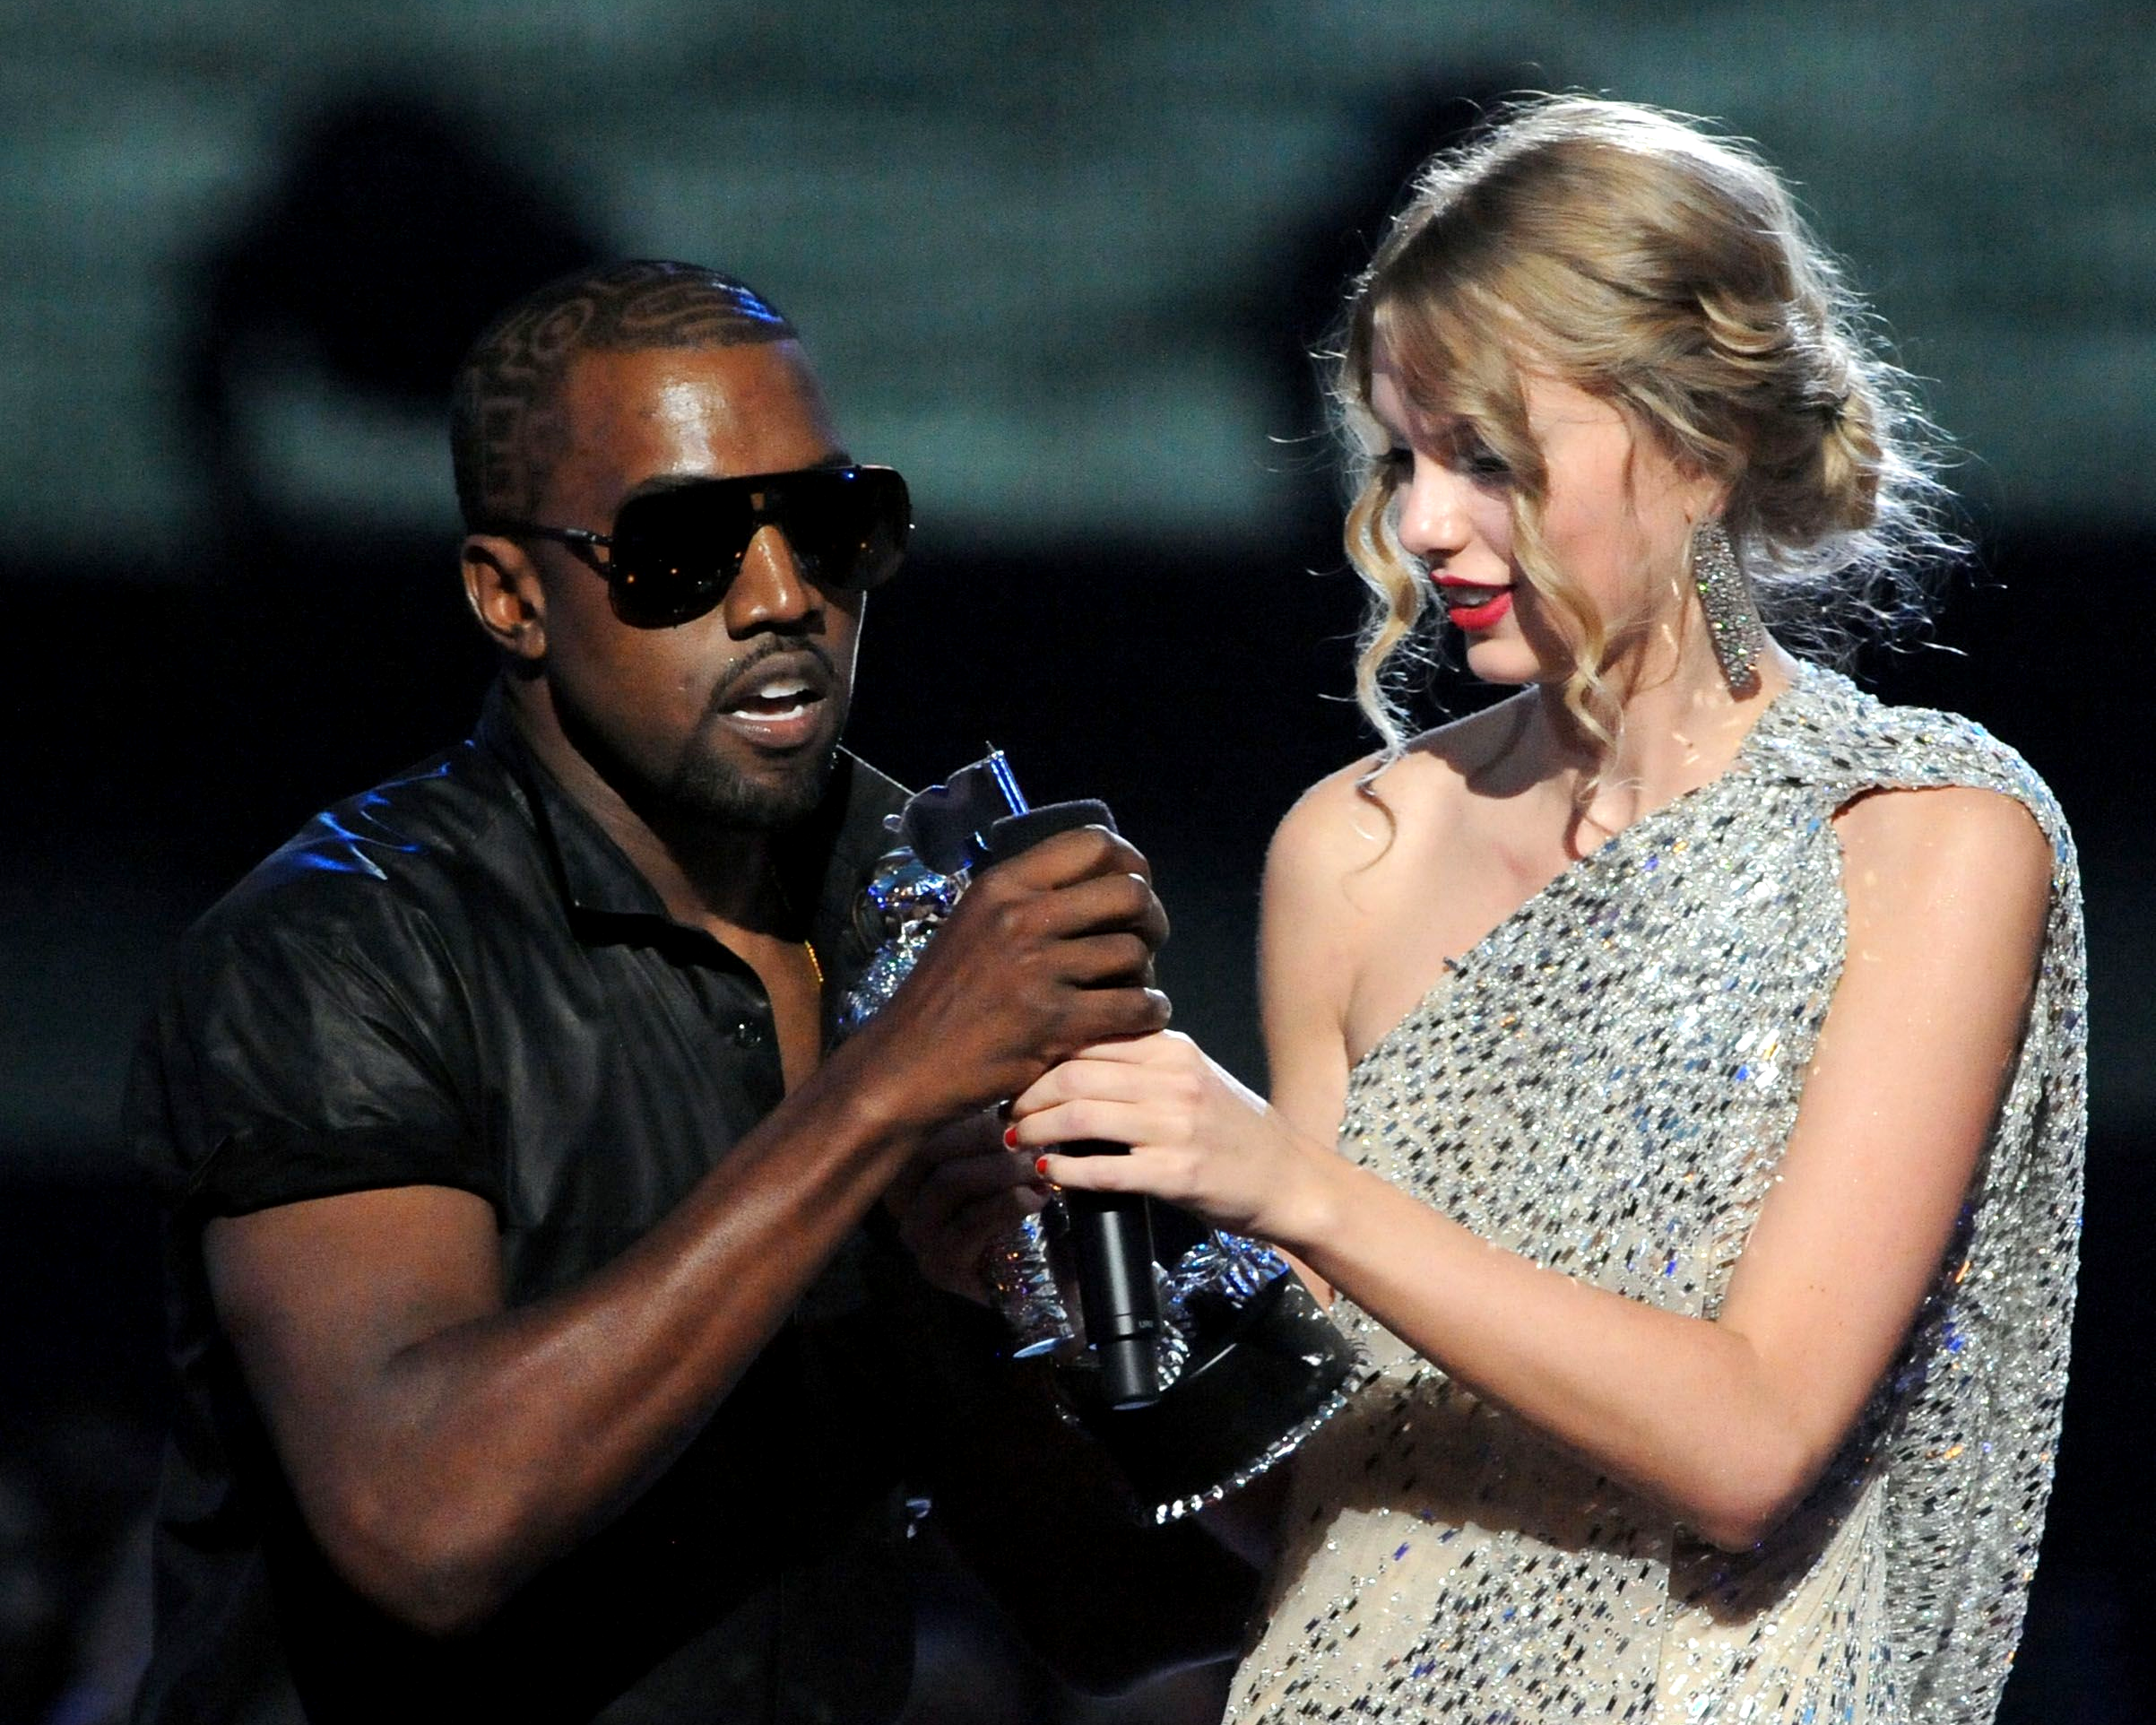 Канье Уэст прерывает речь Тейлор Свифт на VMA 2009